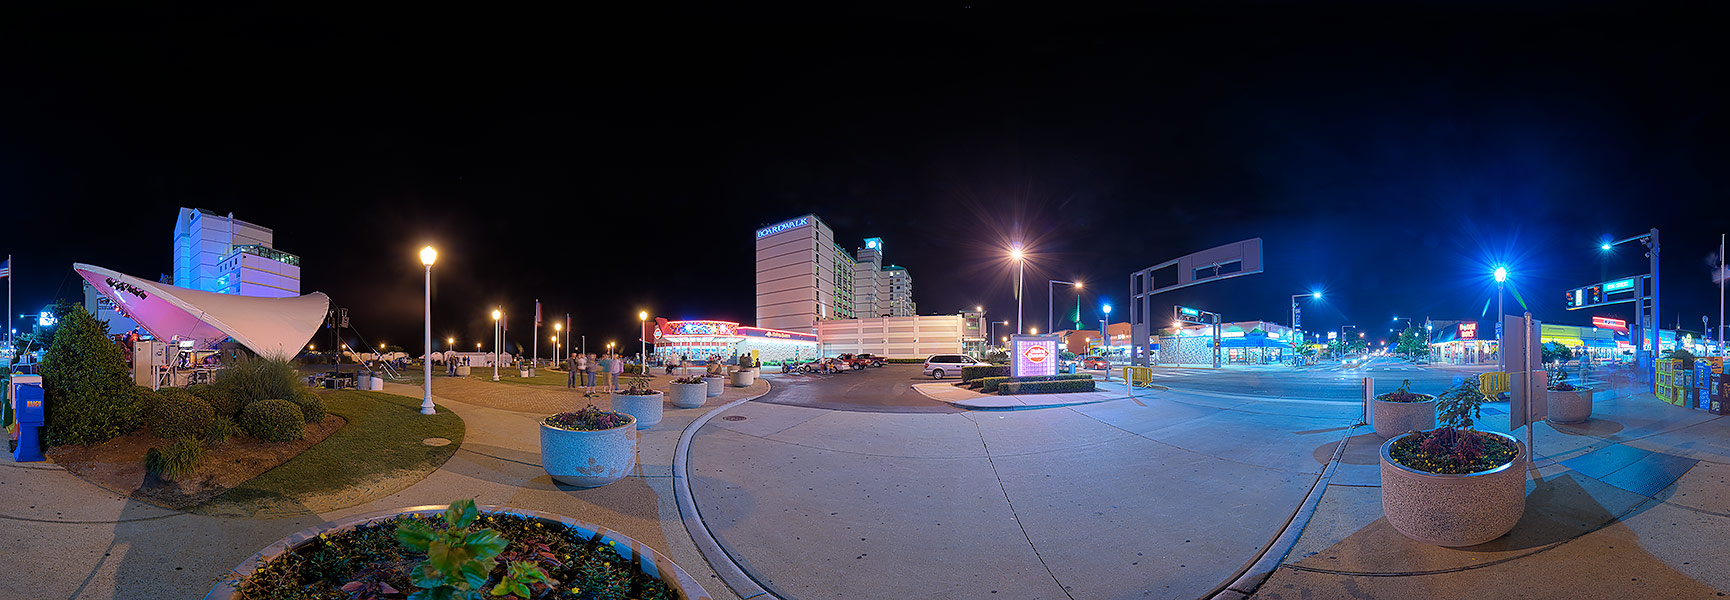 buddy's blog: Night-time Virginia Beach Hilton--rooftop ...  |Virginia Beach Night Life